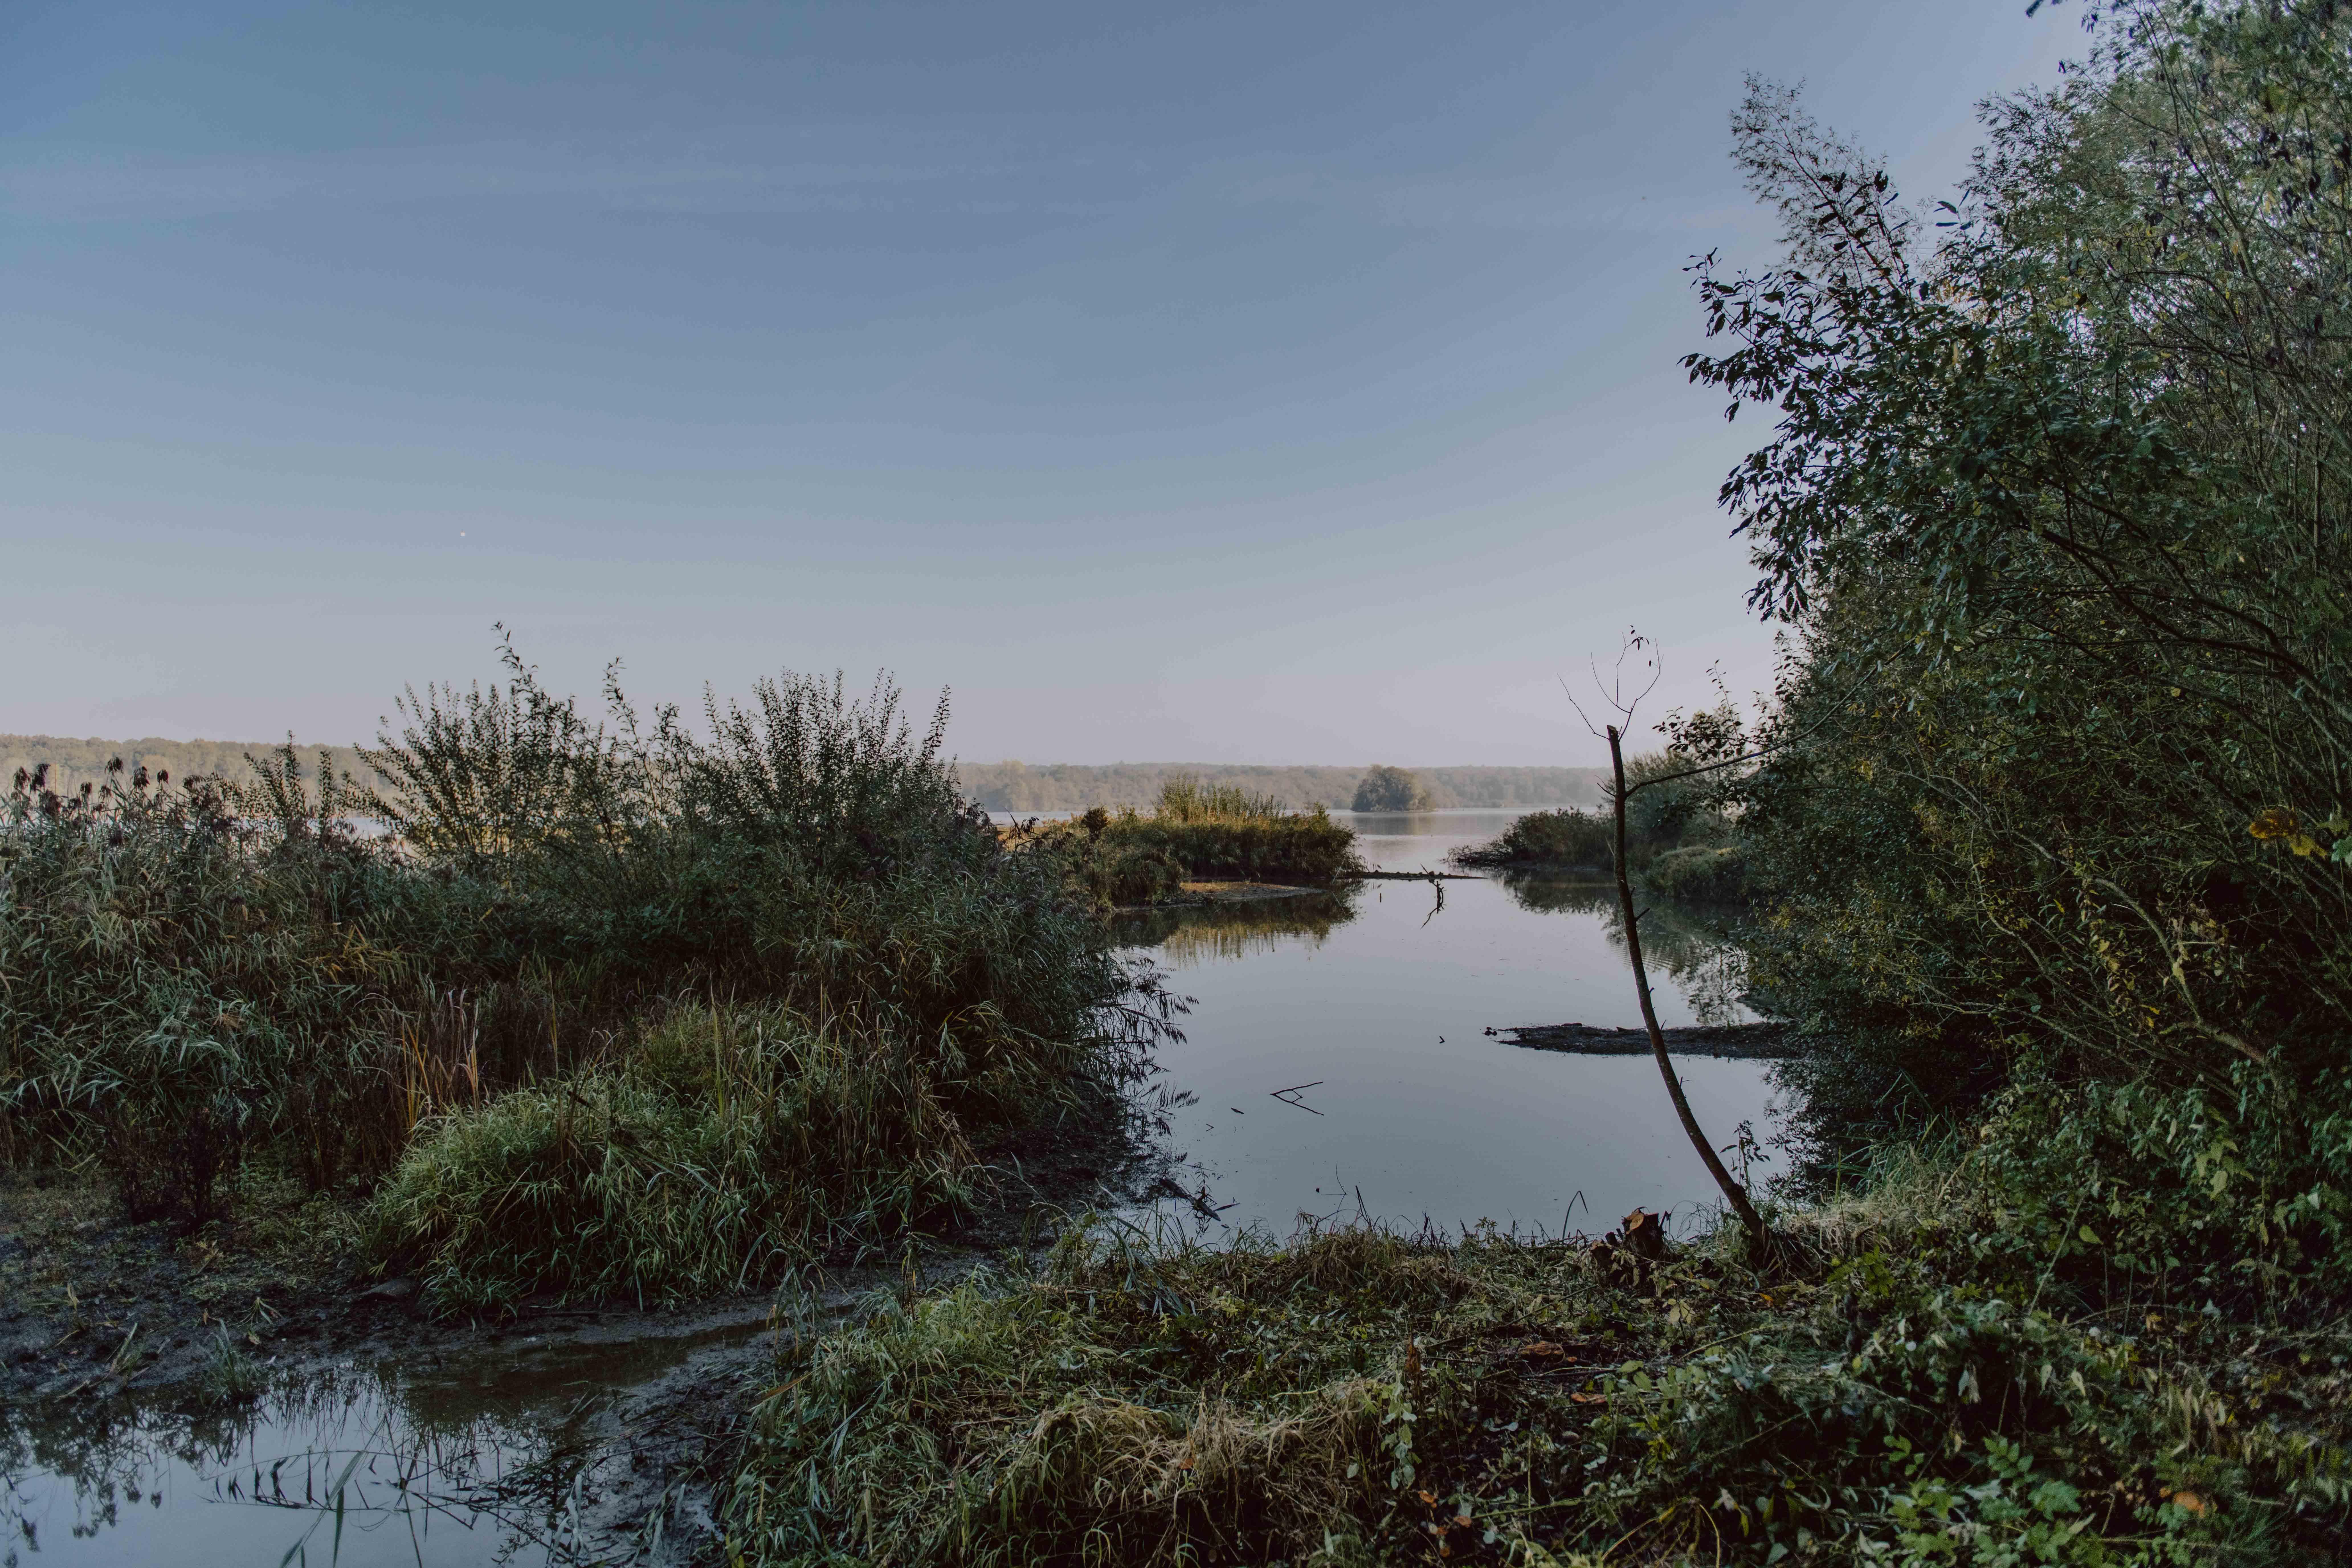 Balade autour de l'étang de Virelles